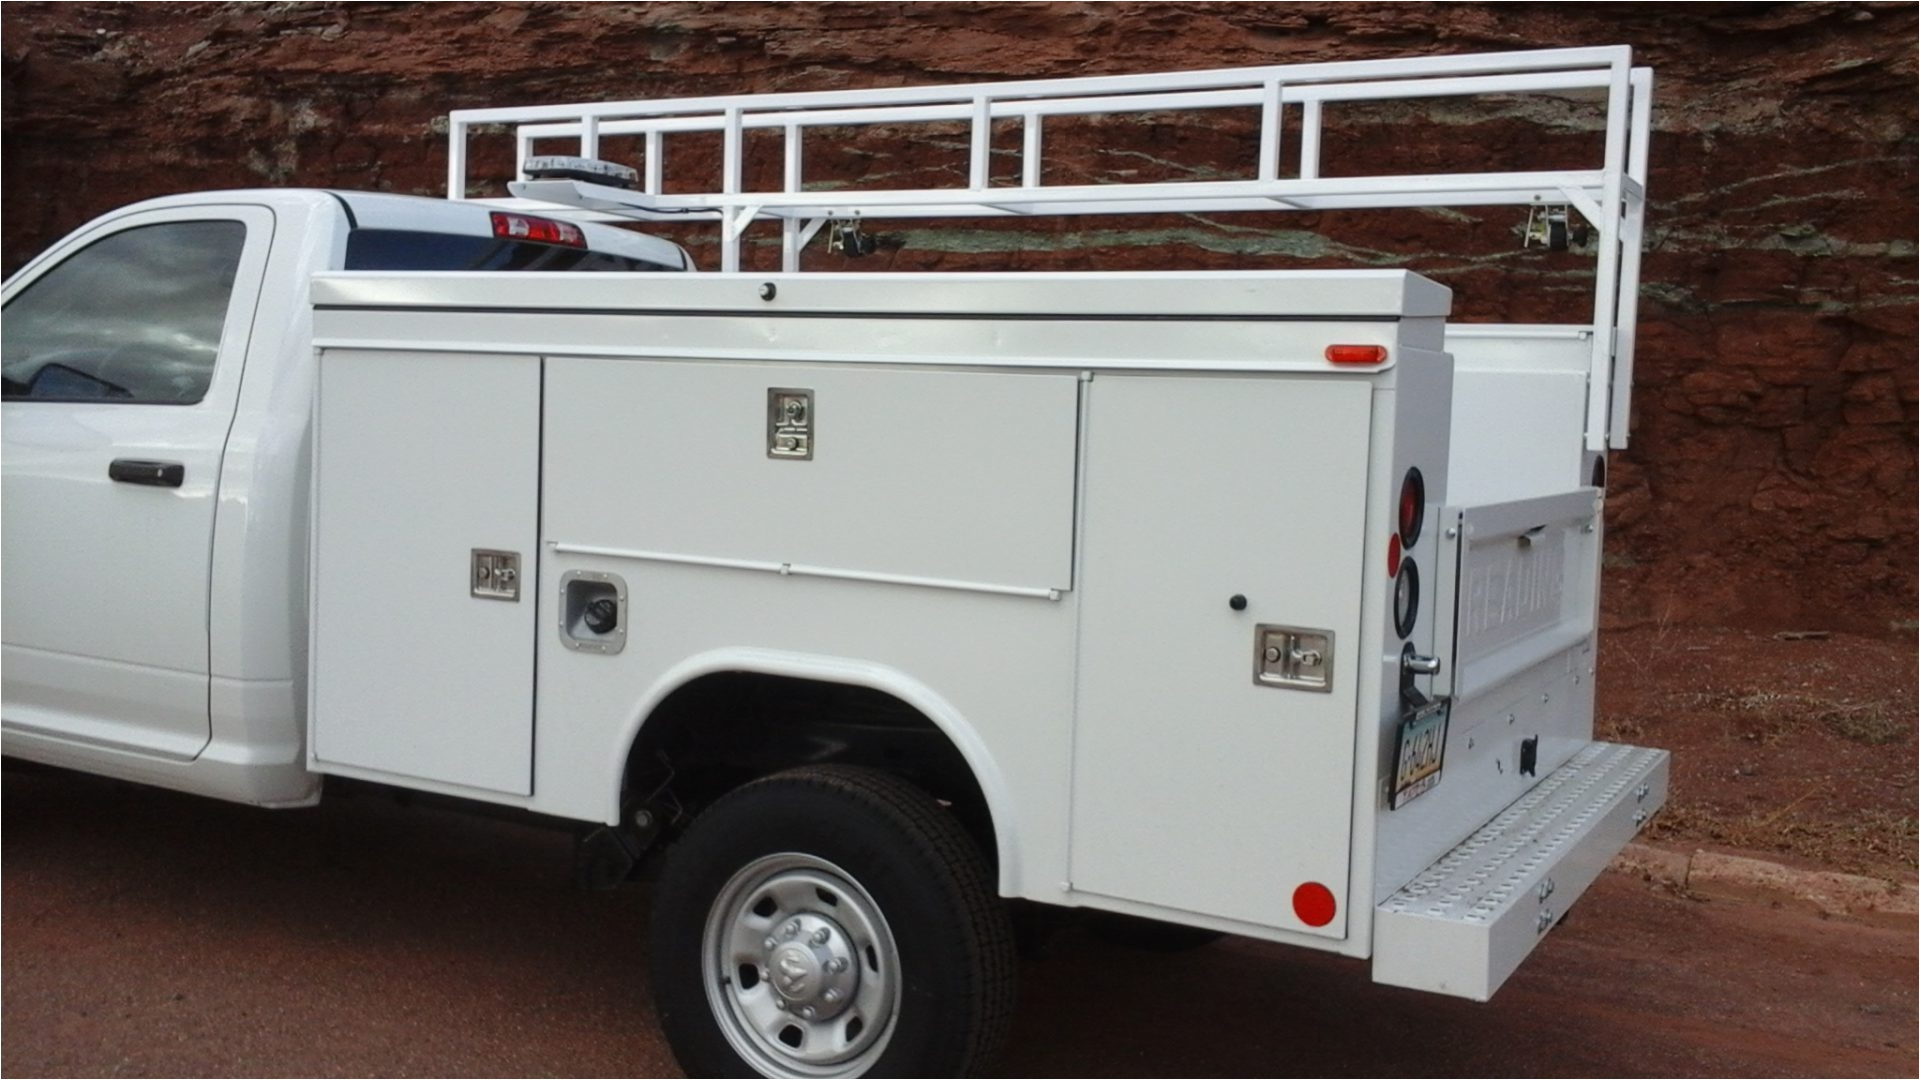 Kargo Master Service Body Ladder Rack Guide Gear Full Size Heavy Duty Universal Aluminum Truck Rack Pipe